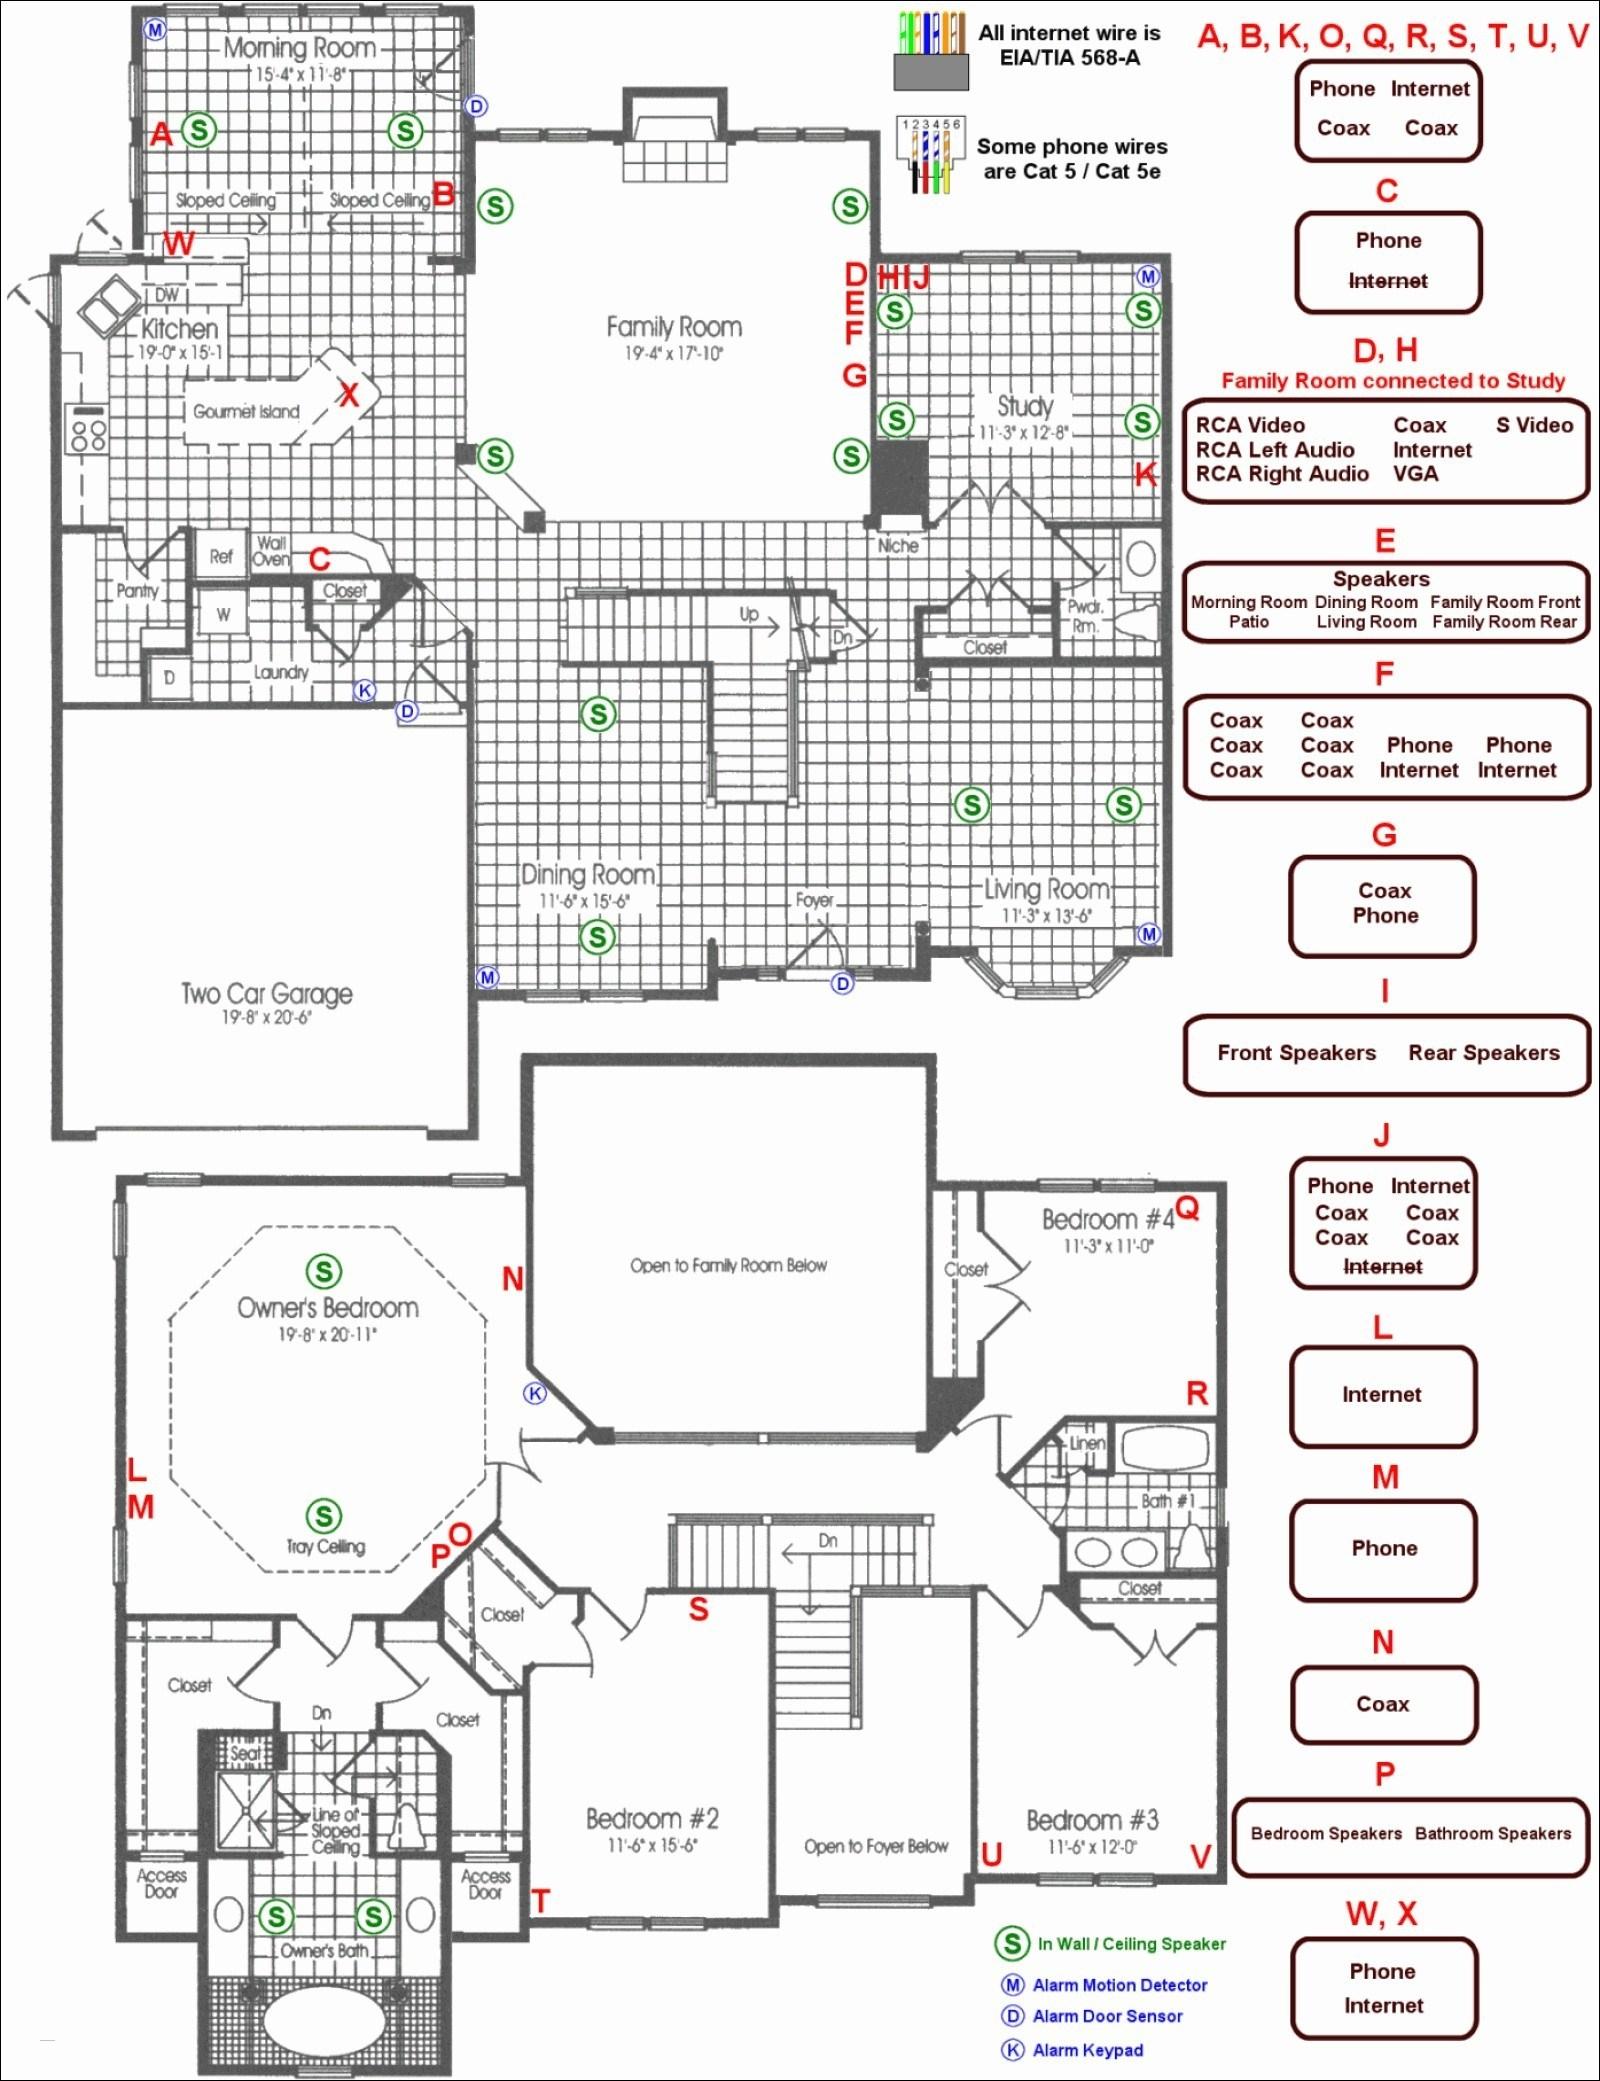 Bridgeport Series 2 Wiring Diagram | Free Wiring Diagram on